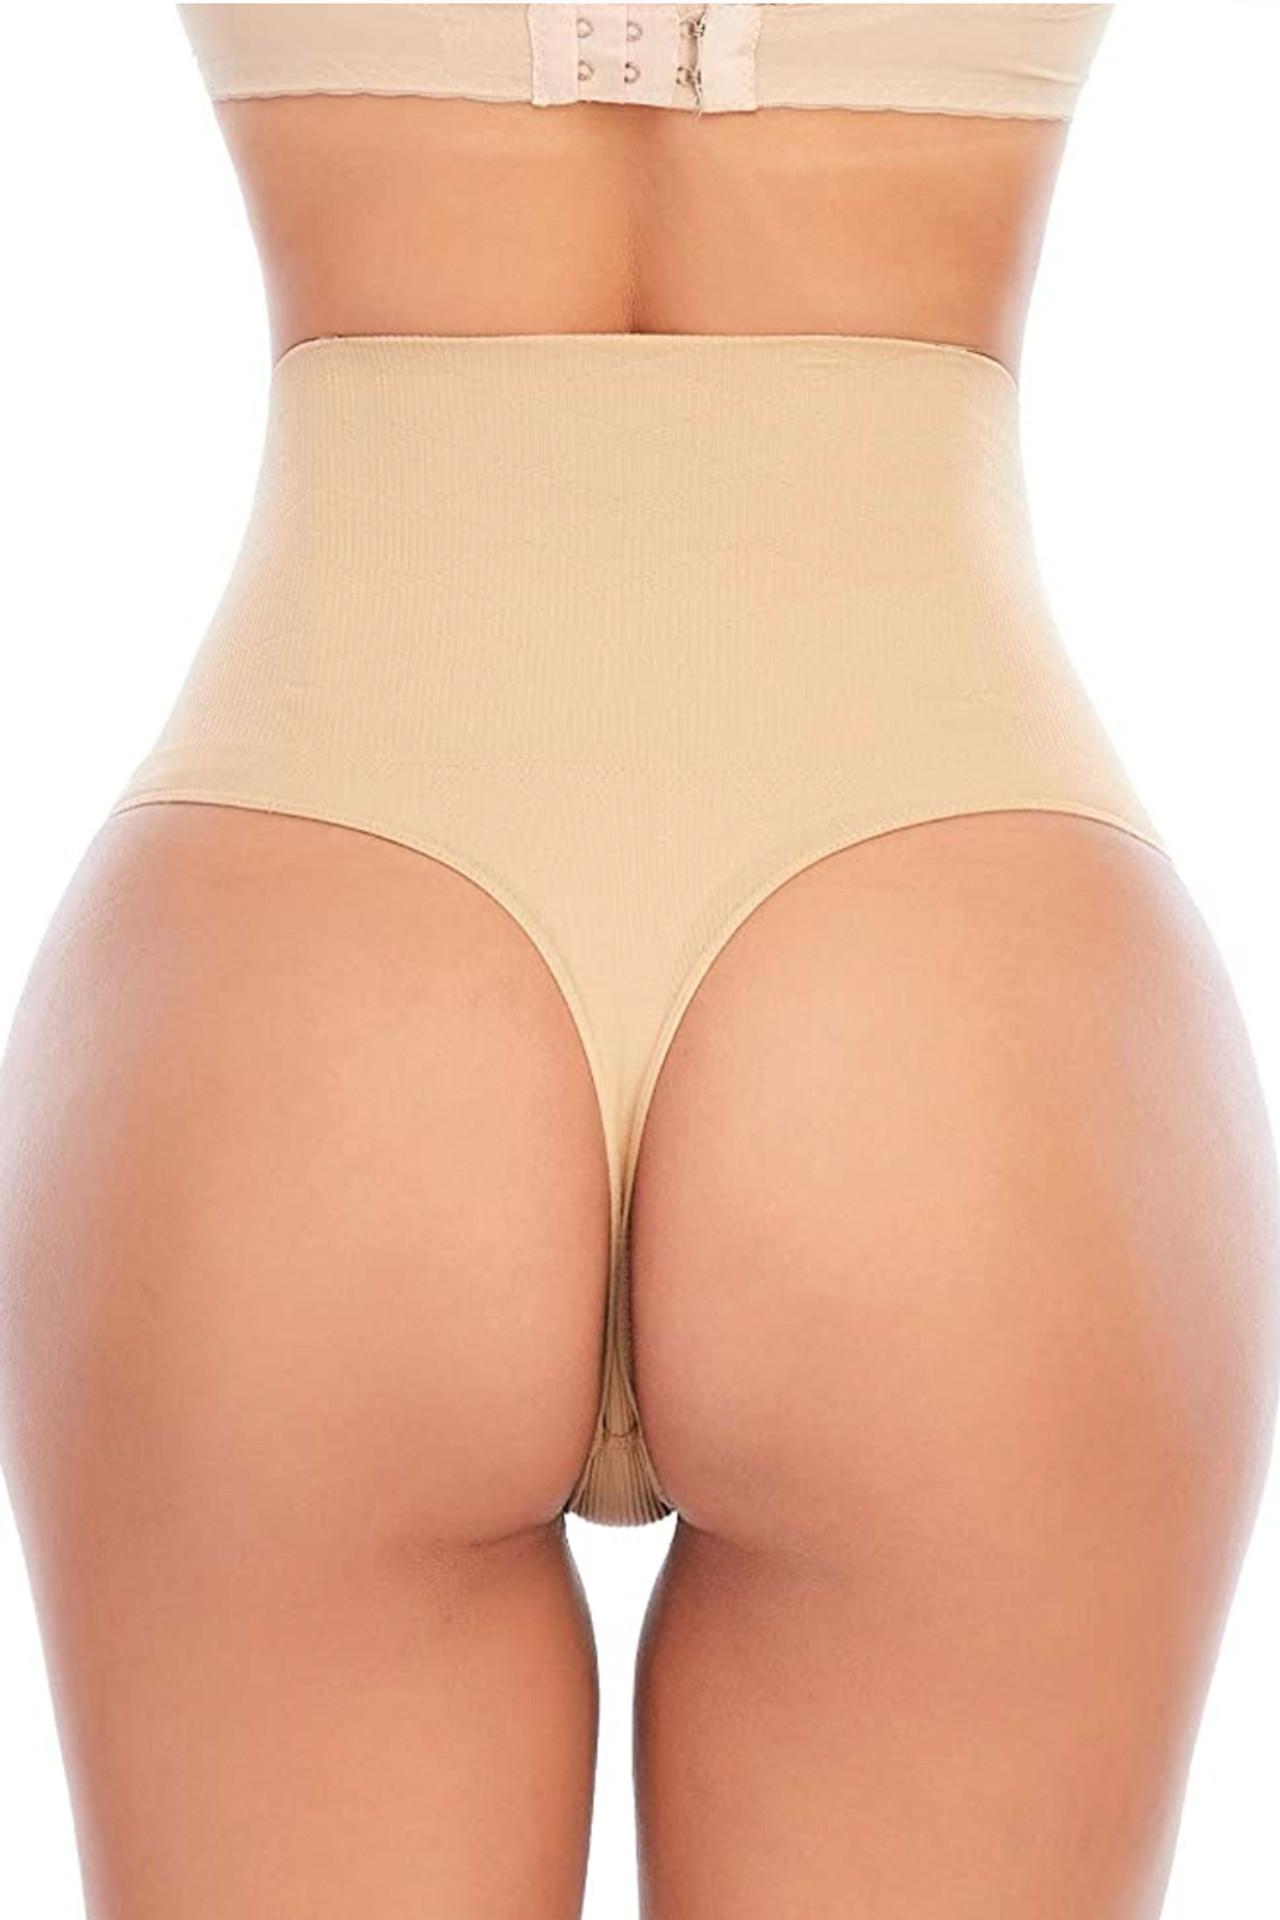 Tummy Trimmer High Waist Thong Panty Girdle